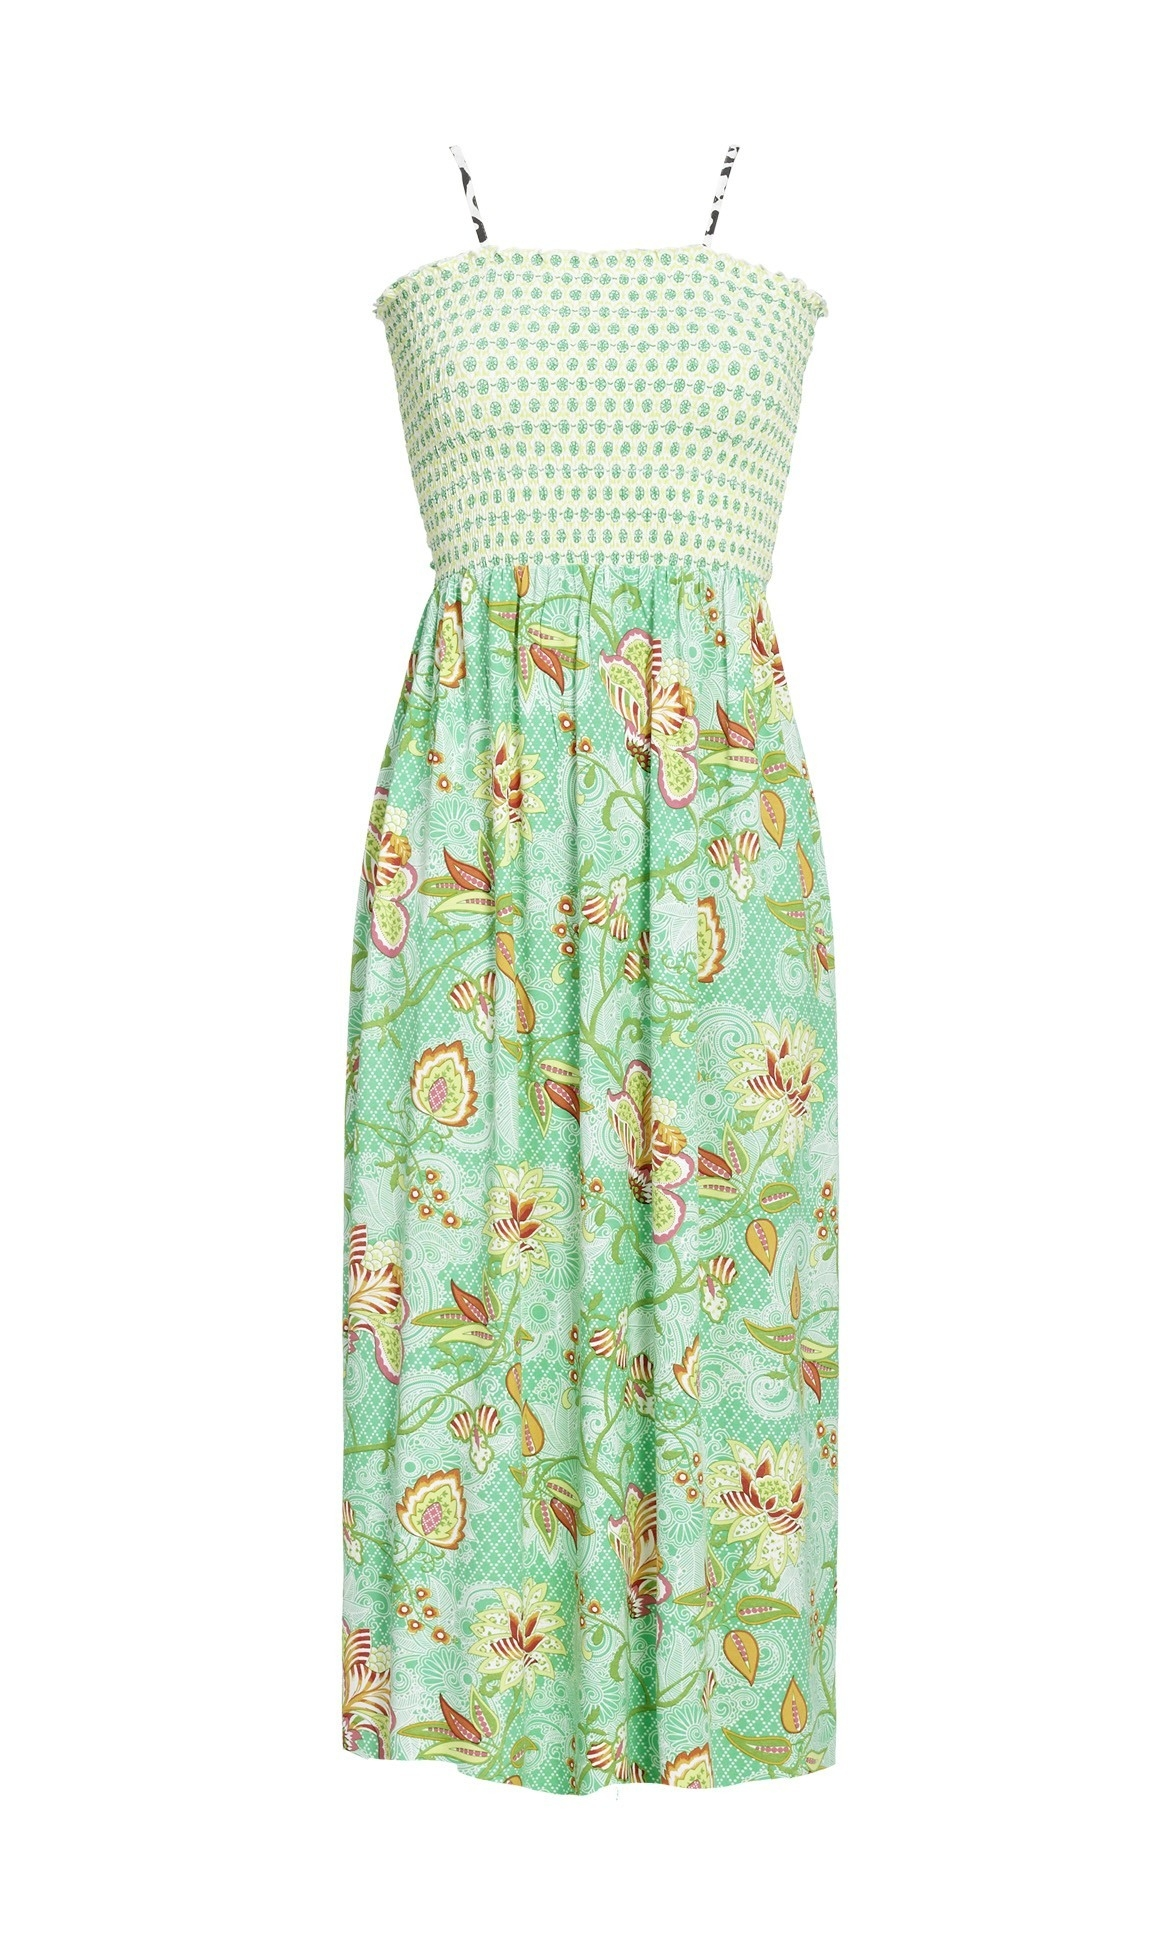 10 Fantastisch Sommerkleid Gr 42 Design15 Spektakulär Sommerkleid Gr 42 Stylish